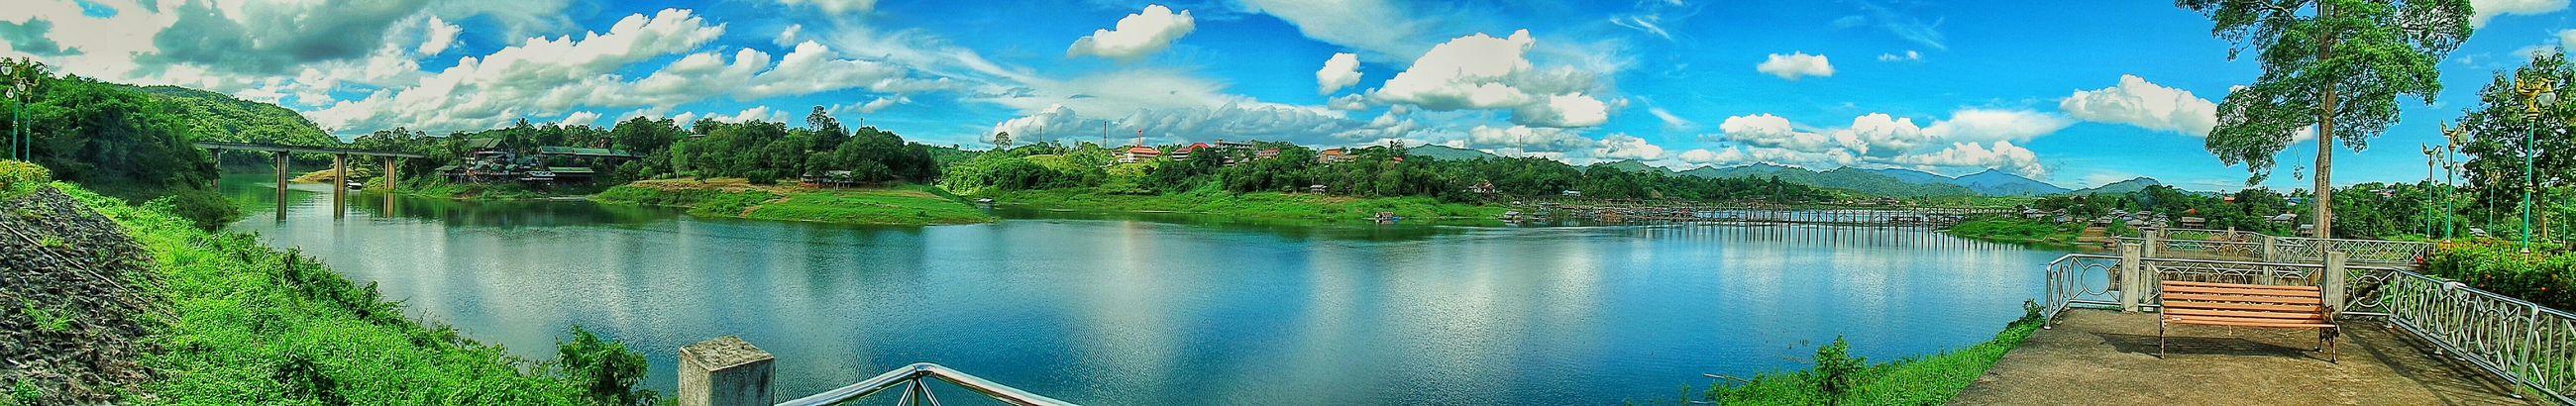 Panorama Clouds And Sky View Waiting ท้องฟ้ากับท้องน้ำ จุดชมวิว Clouds Enjoying Life Relaxing ลำน้ำซองกาเลีย